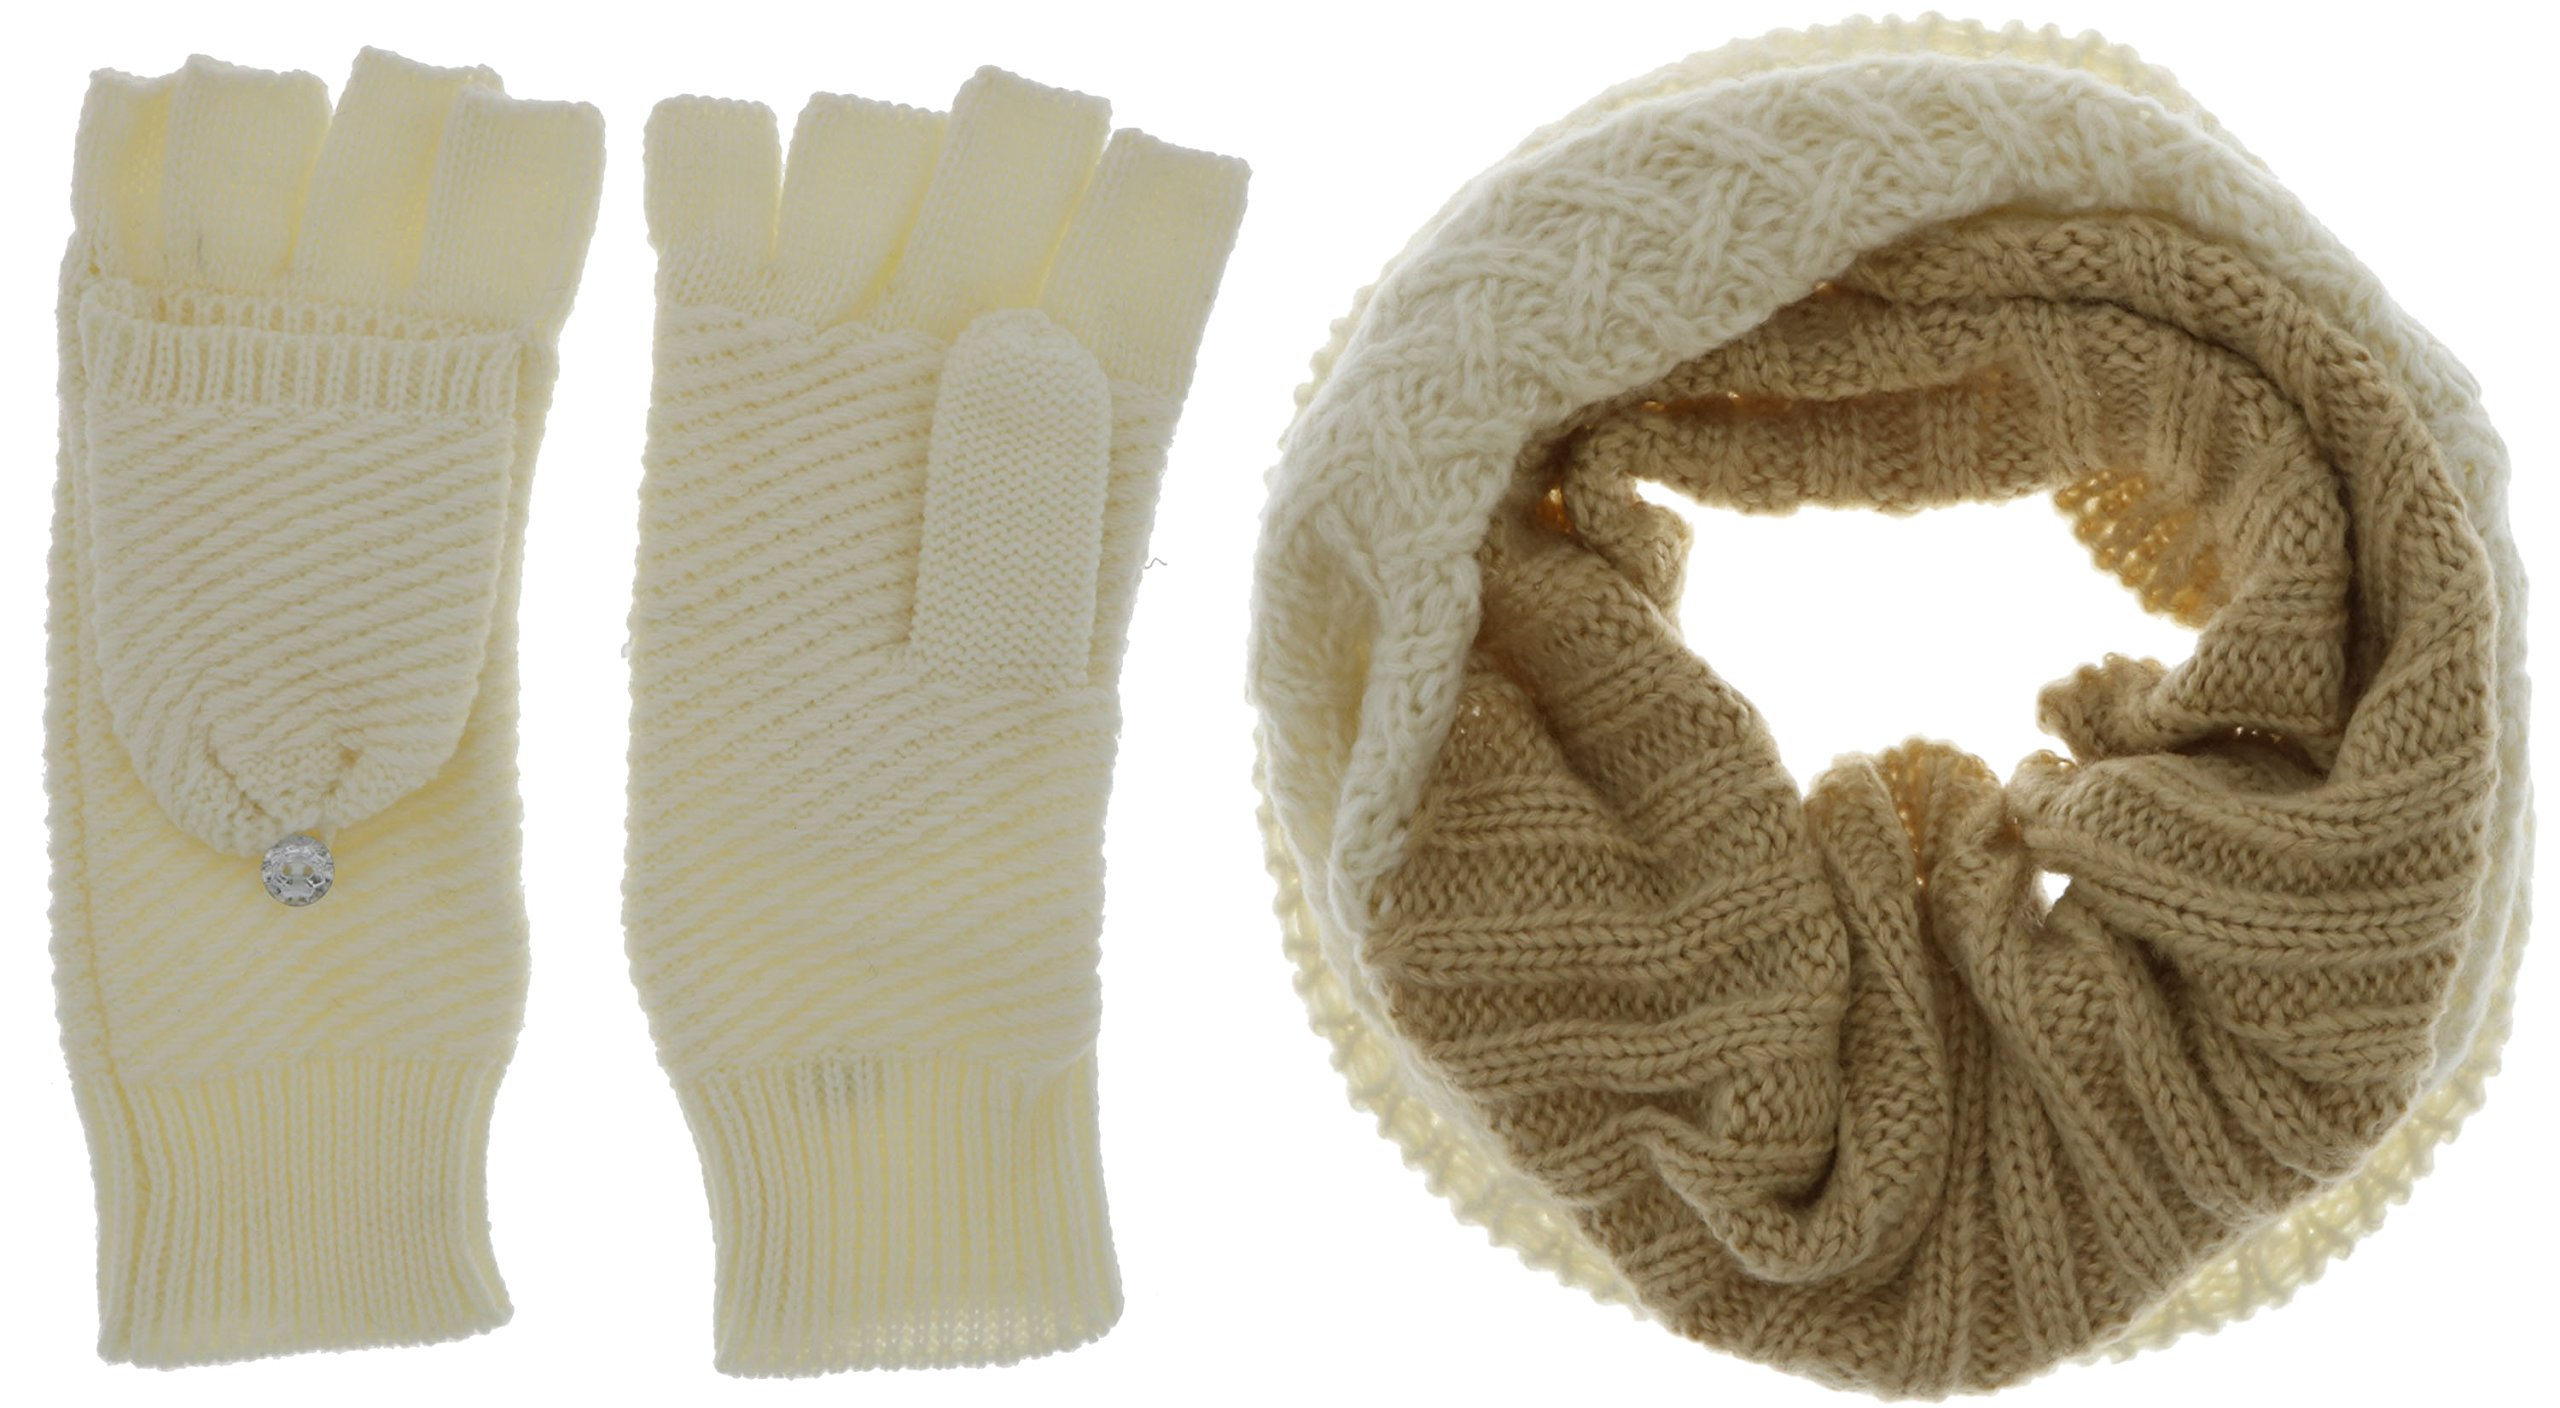 Marilyn Monroe Women's Winter Infinity Scarf and Glove Gift Set (Beige & Cream)